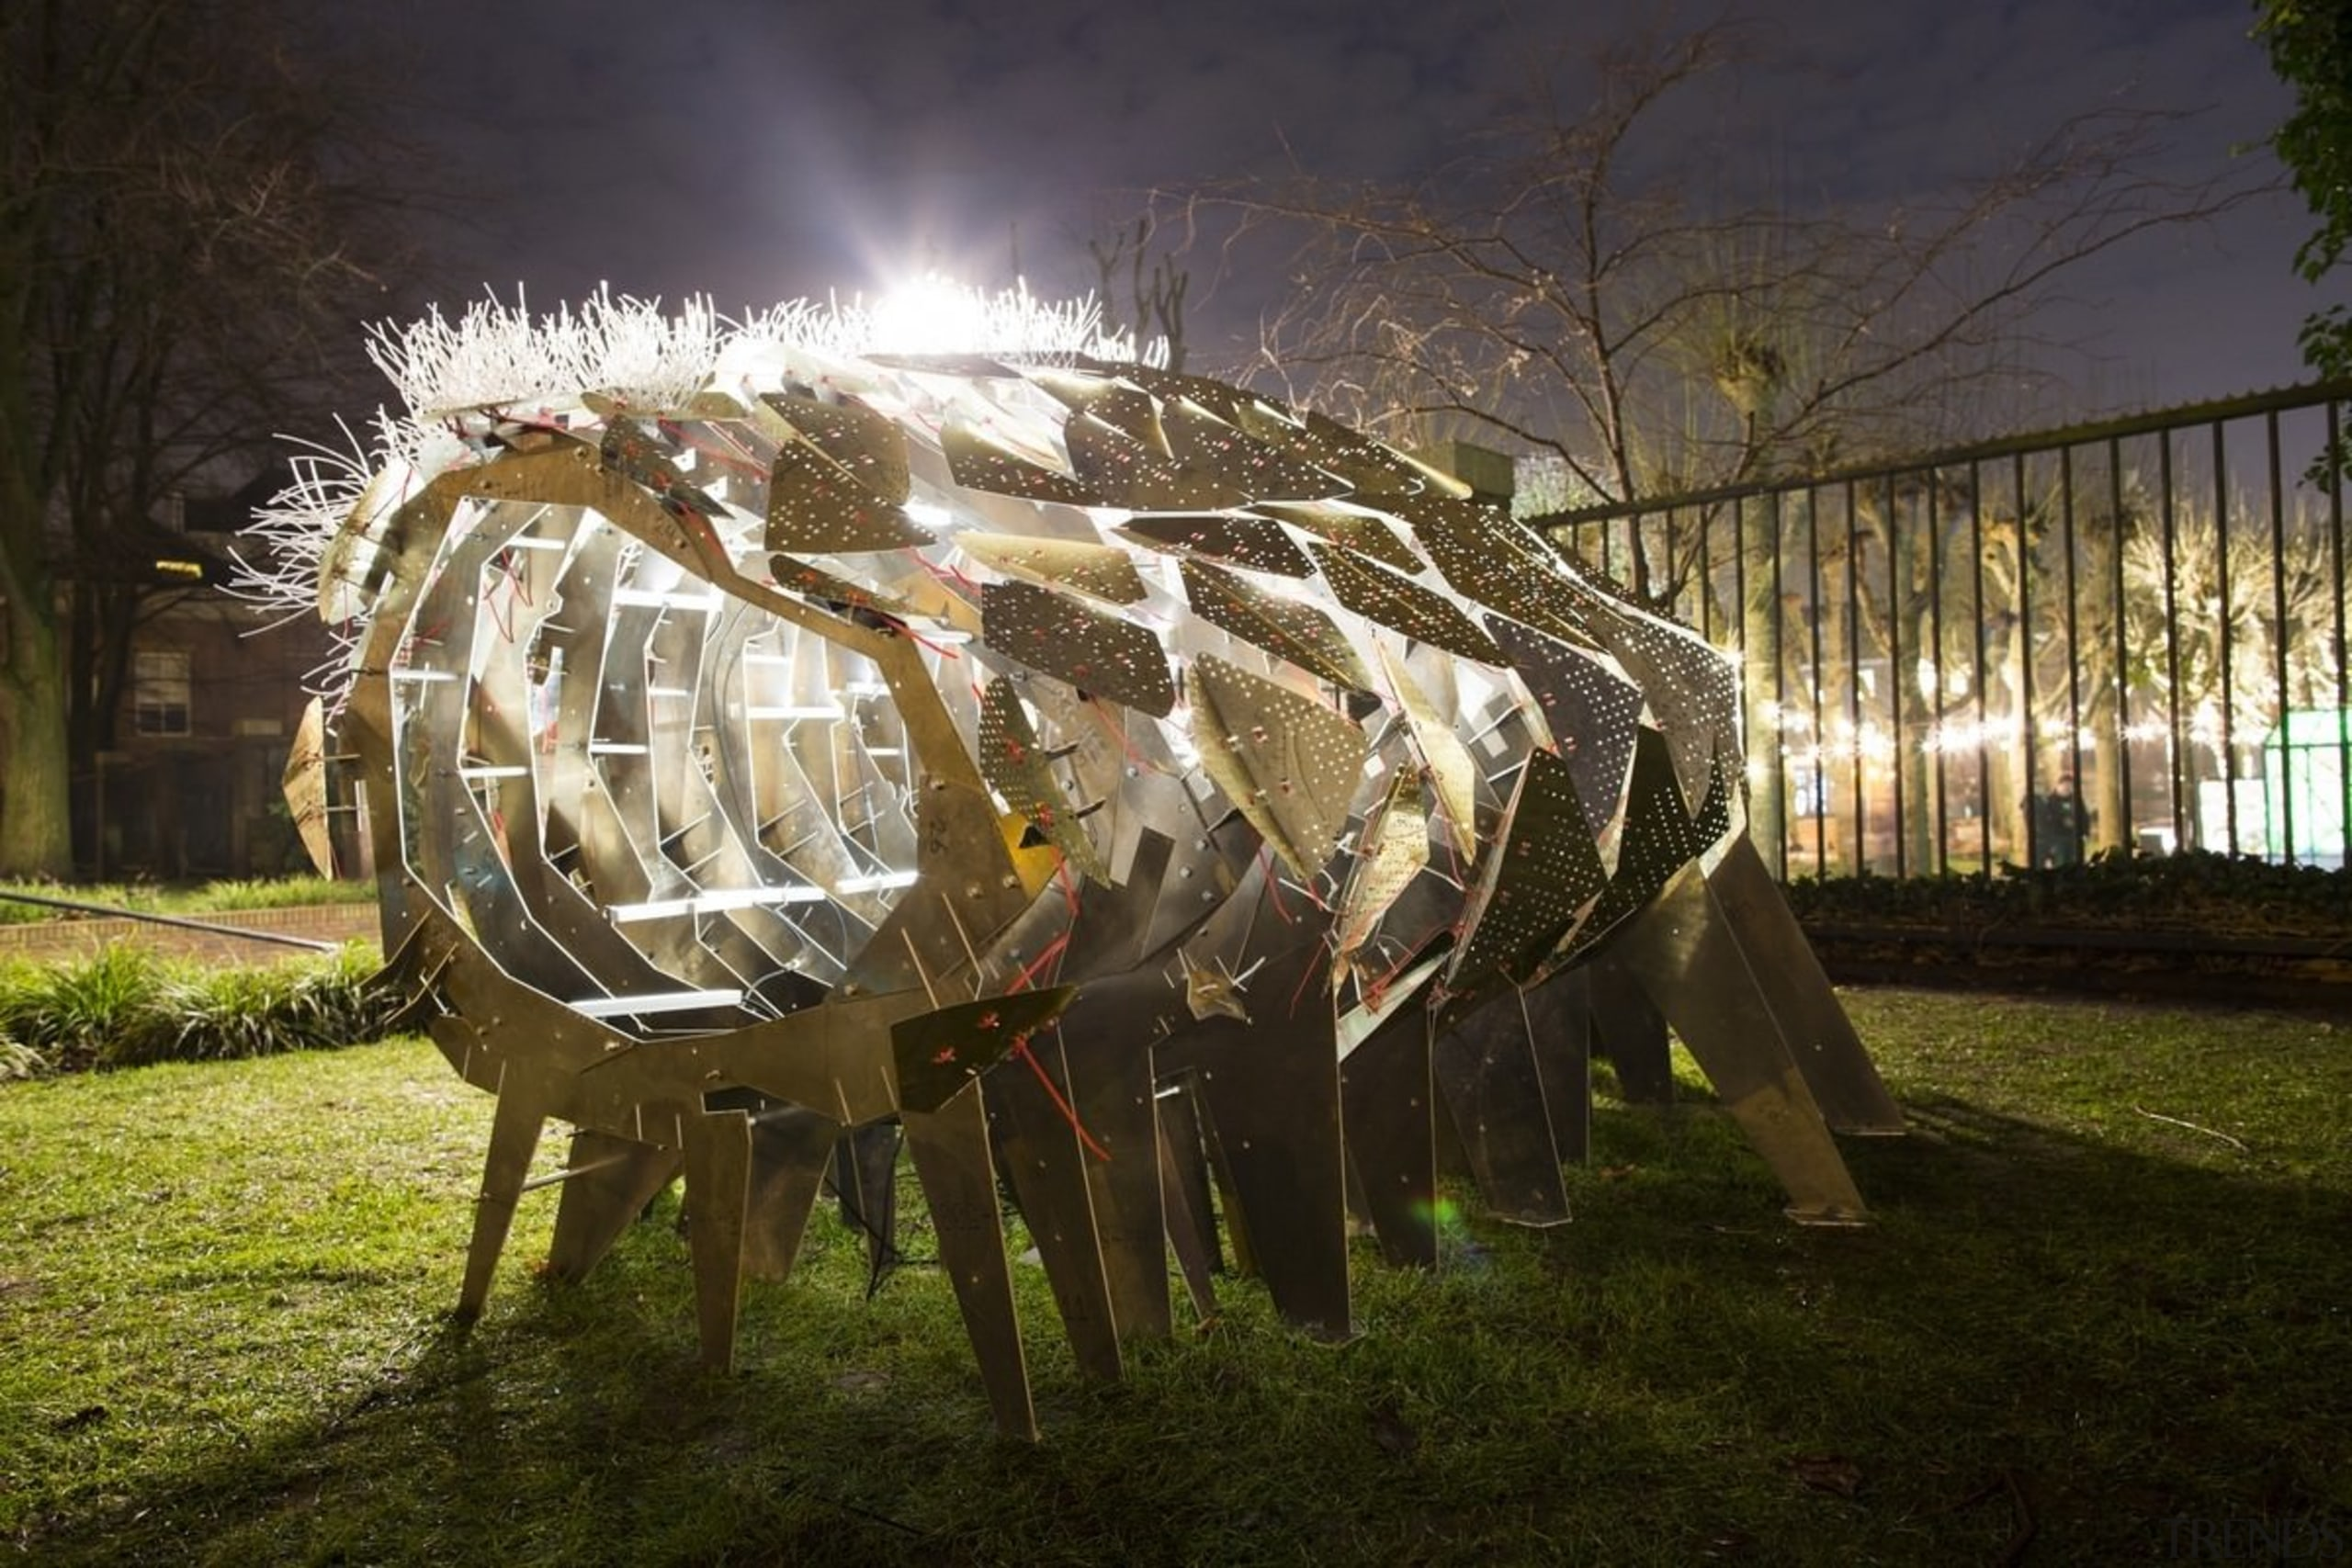 The Flowering Phantasm by Clay Odom - The grass, light, lighting, night, plant, tree, brown